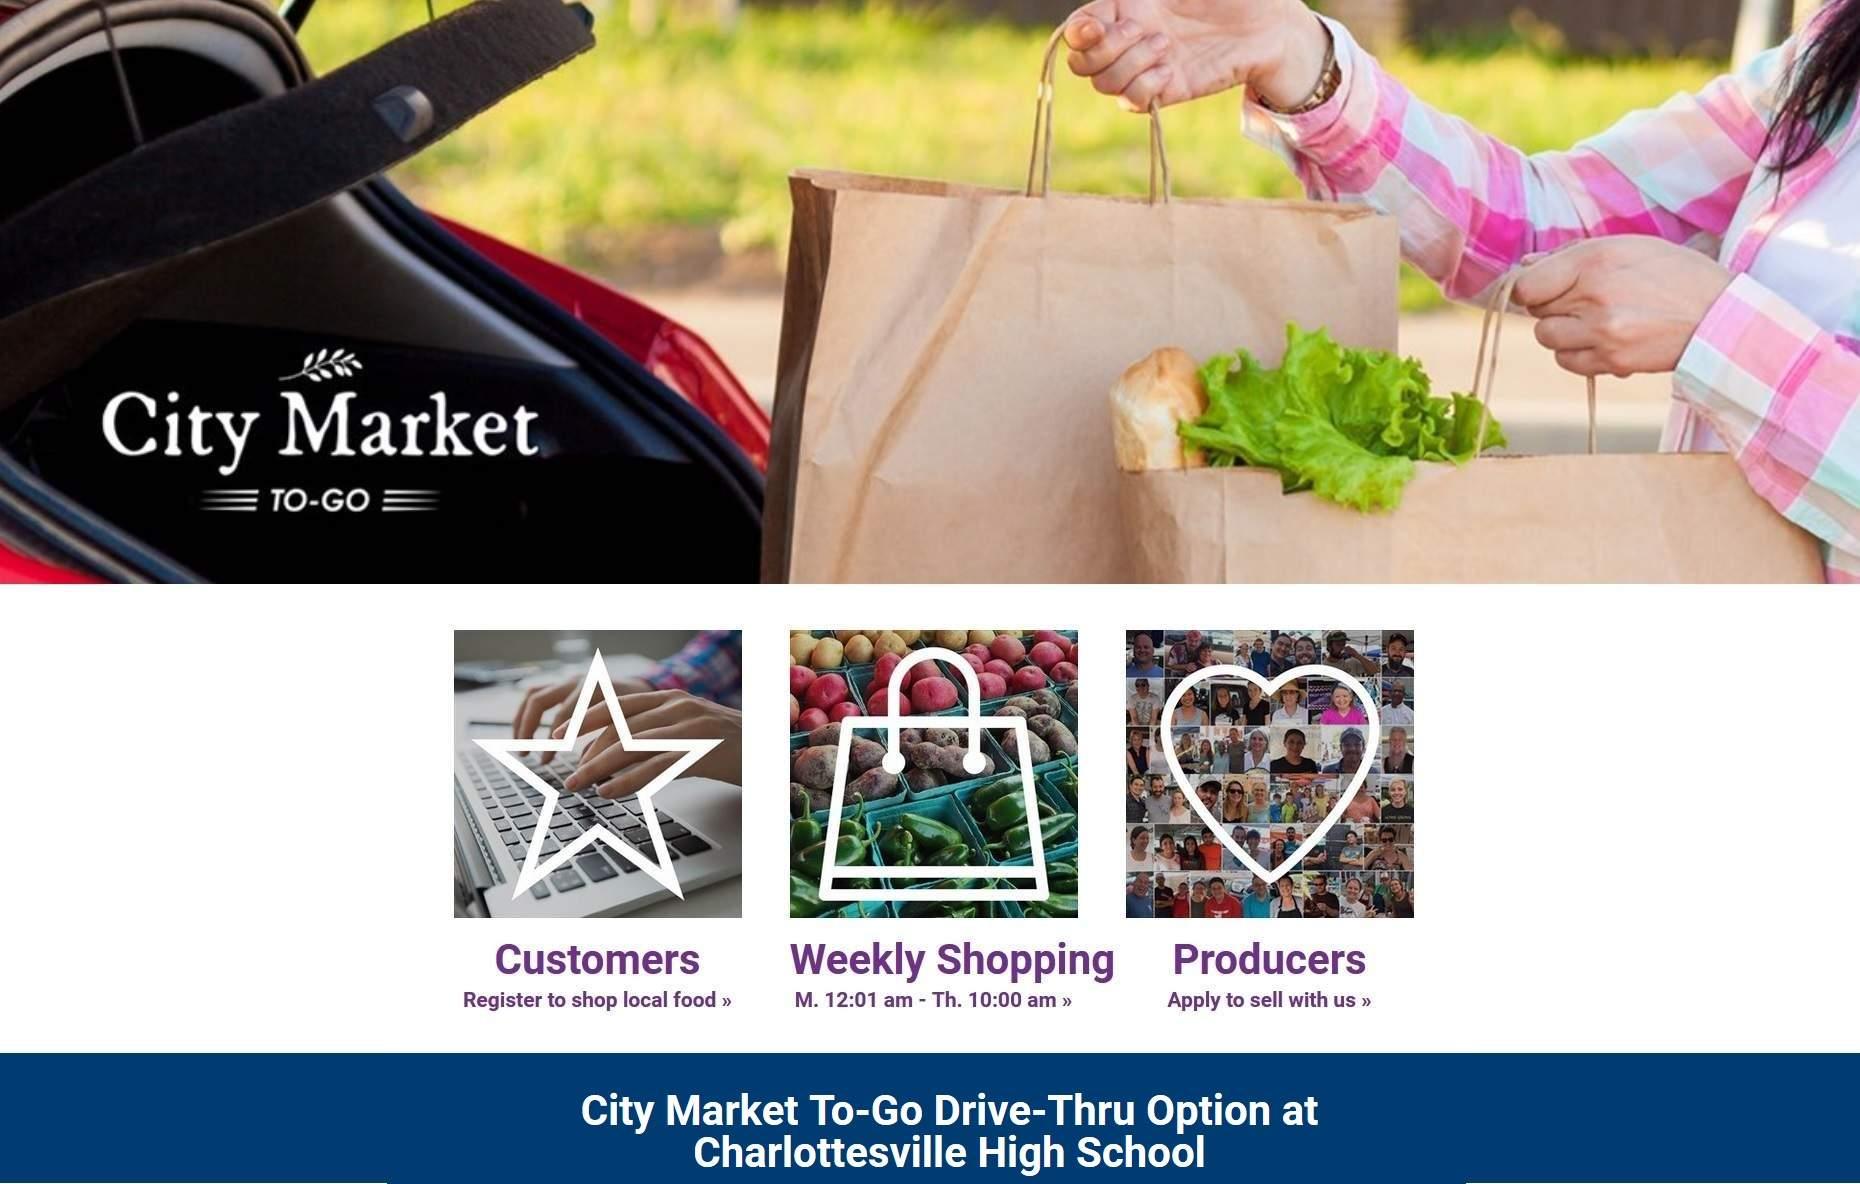 Charlottesville City Market To-Go - CHS